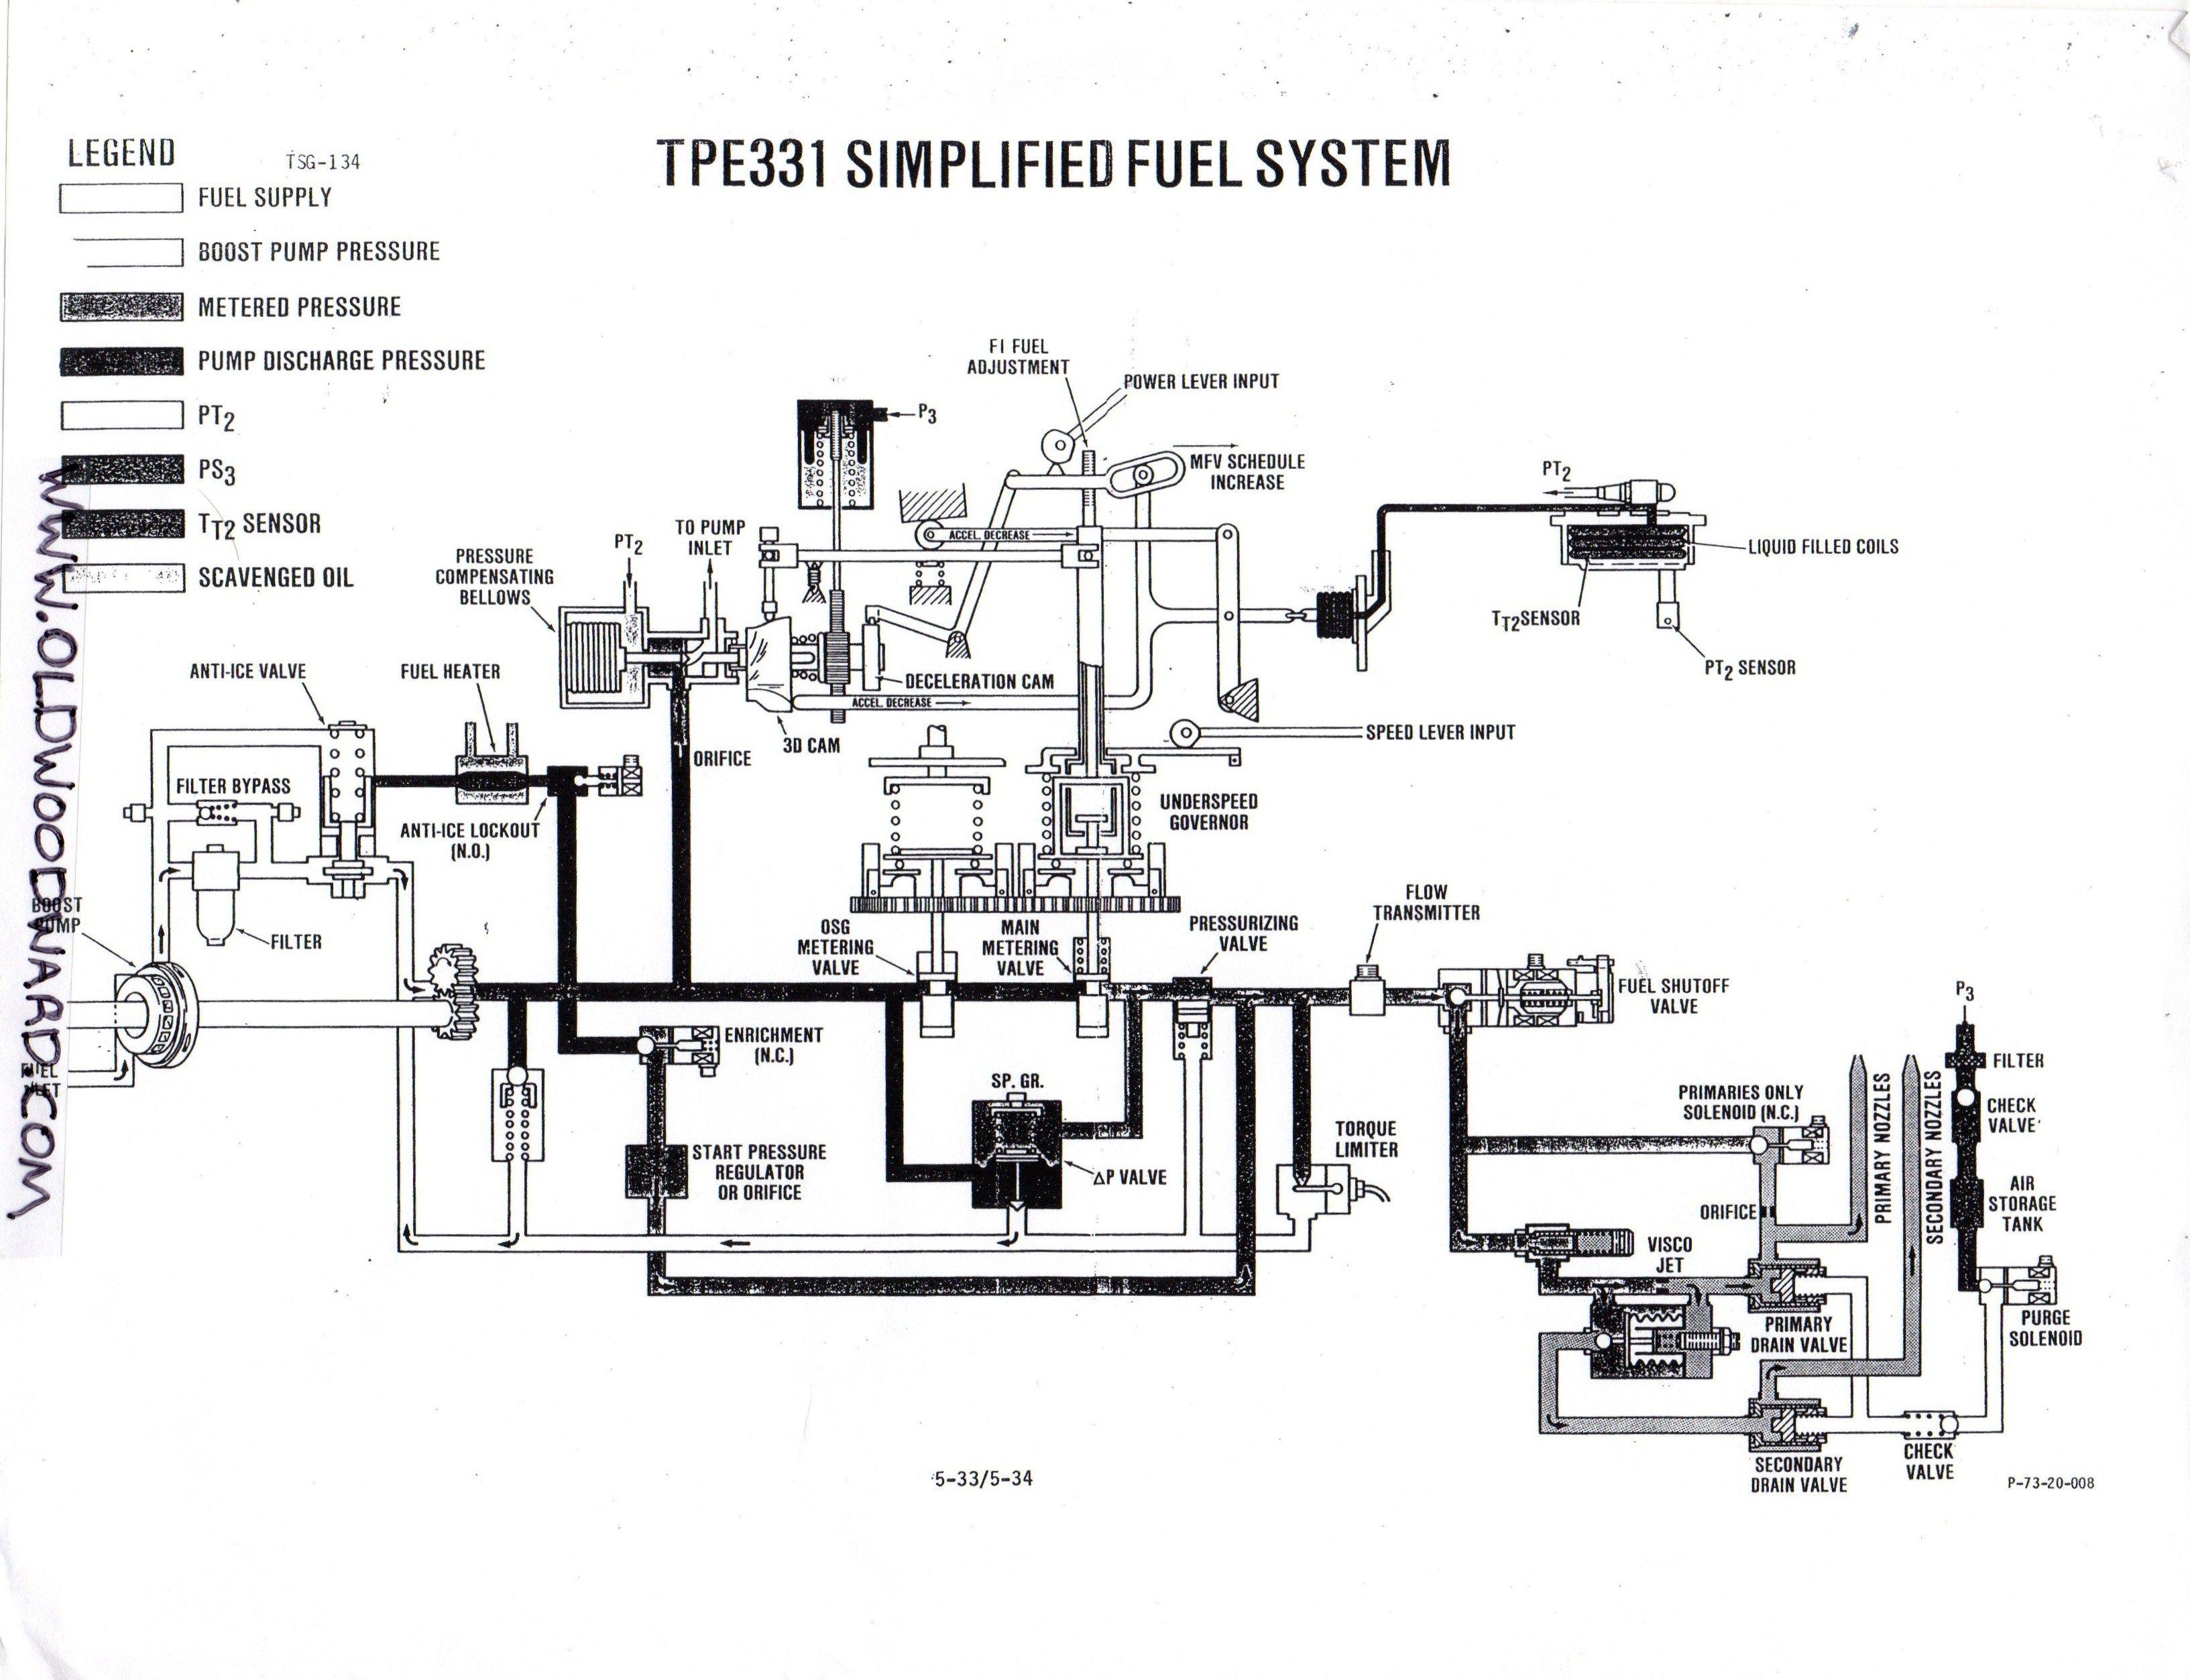 small resolution of woodward tpe331 gas turbine main engine control training manual